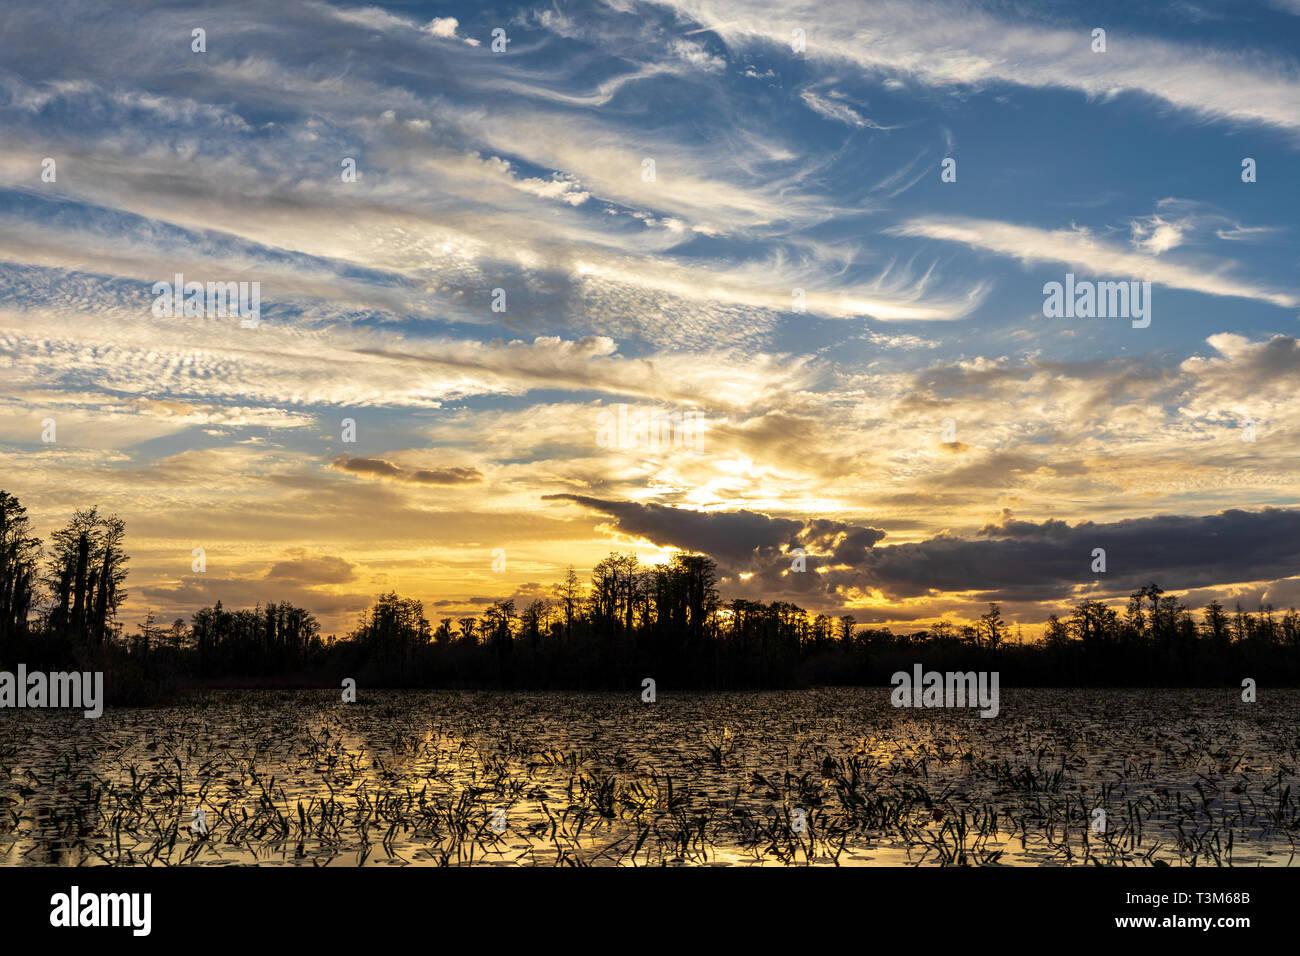 Landscape sunset on east side of Okefenokee swamp refuge. Stock Photo